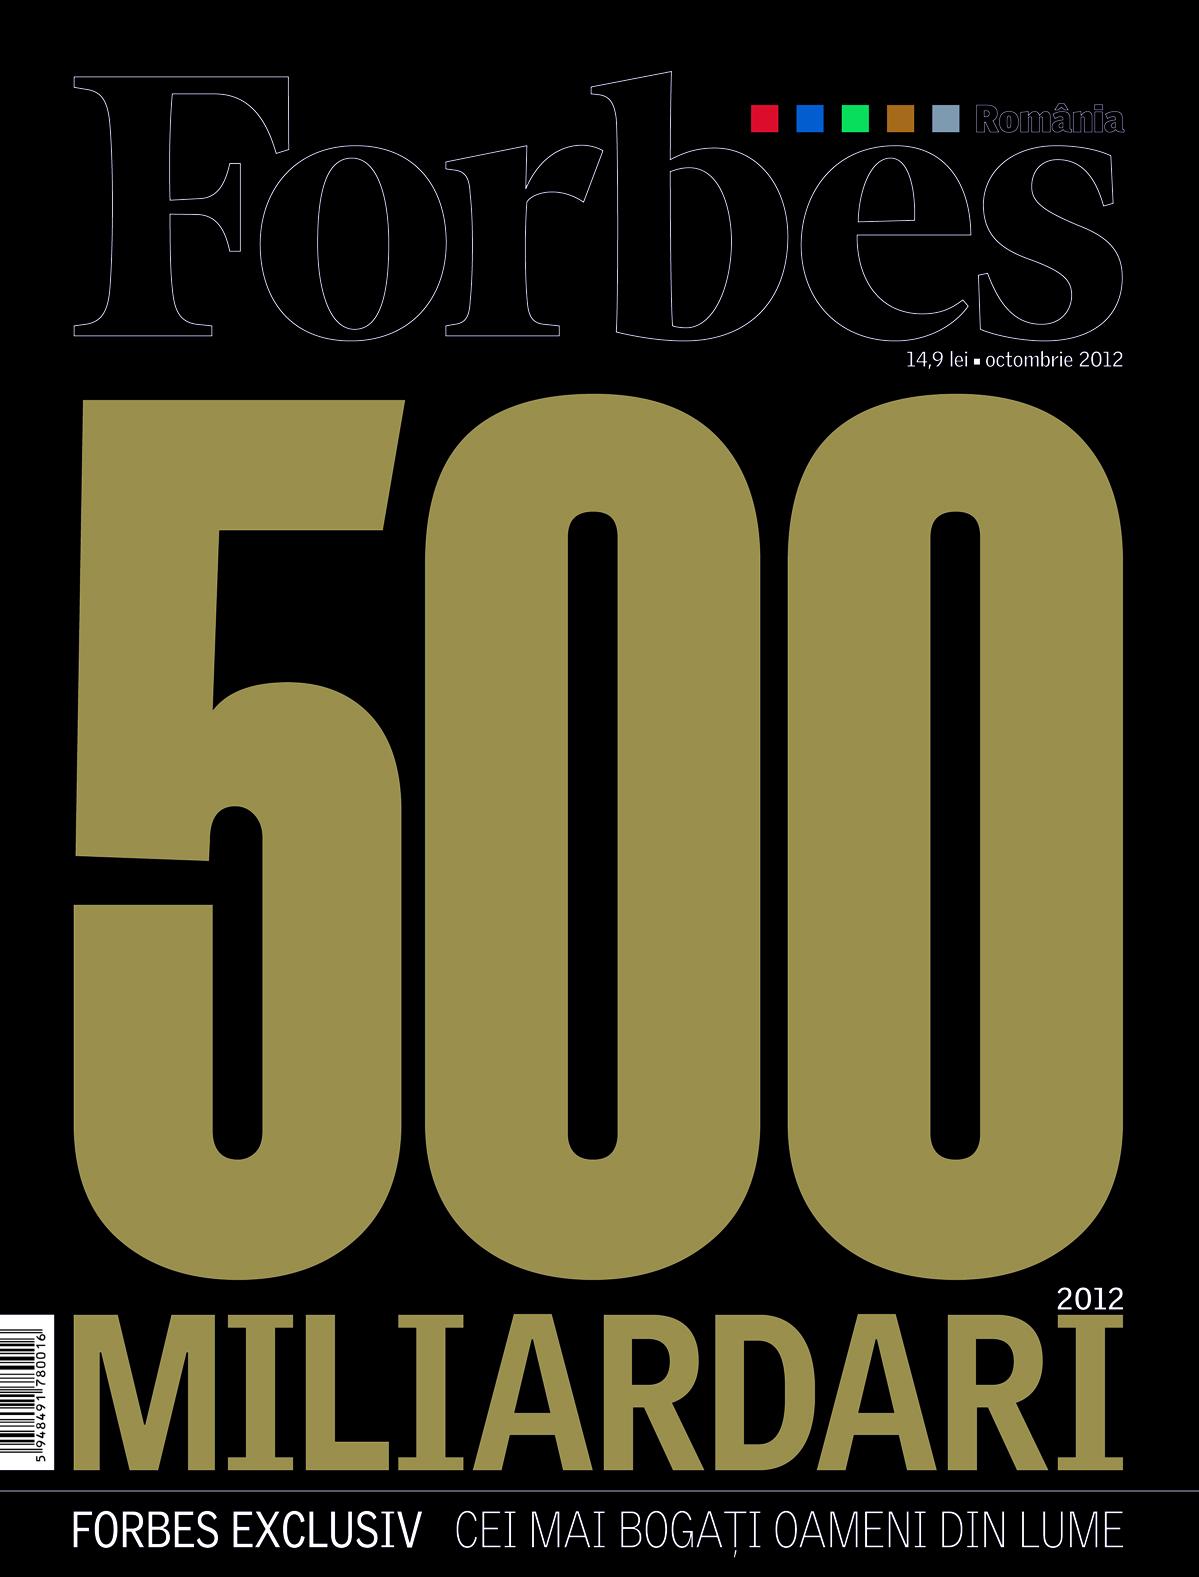 Oct. 2012 - Top 500 Miliardari